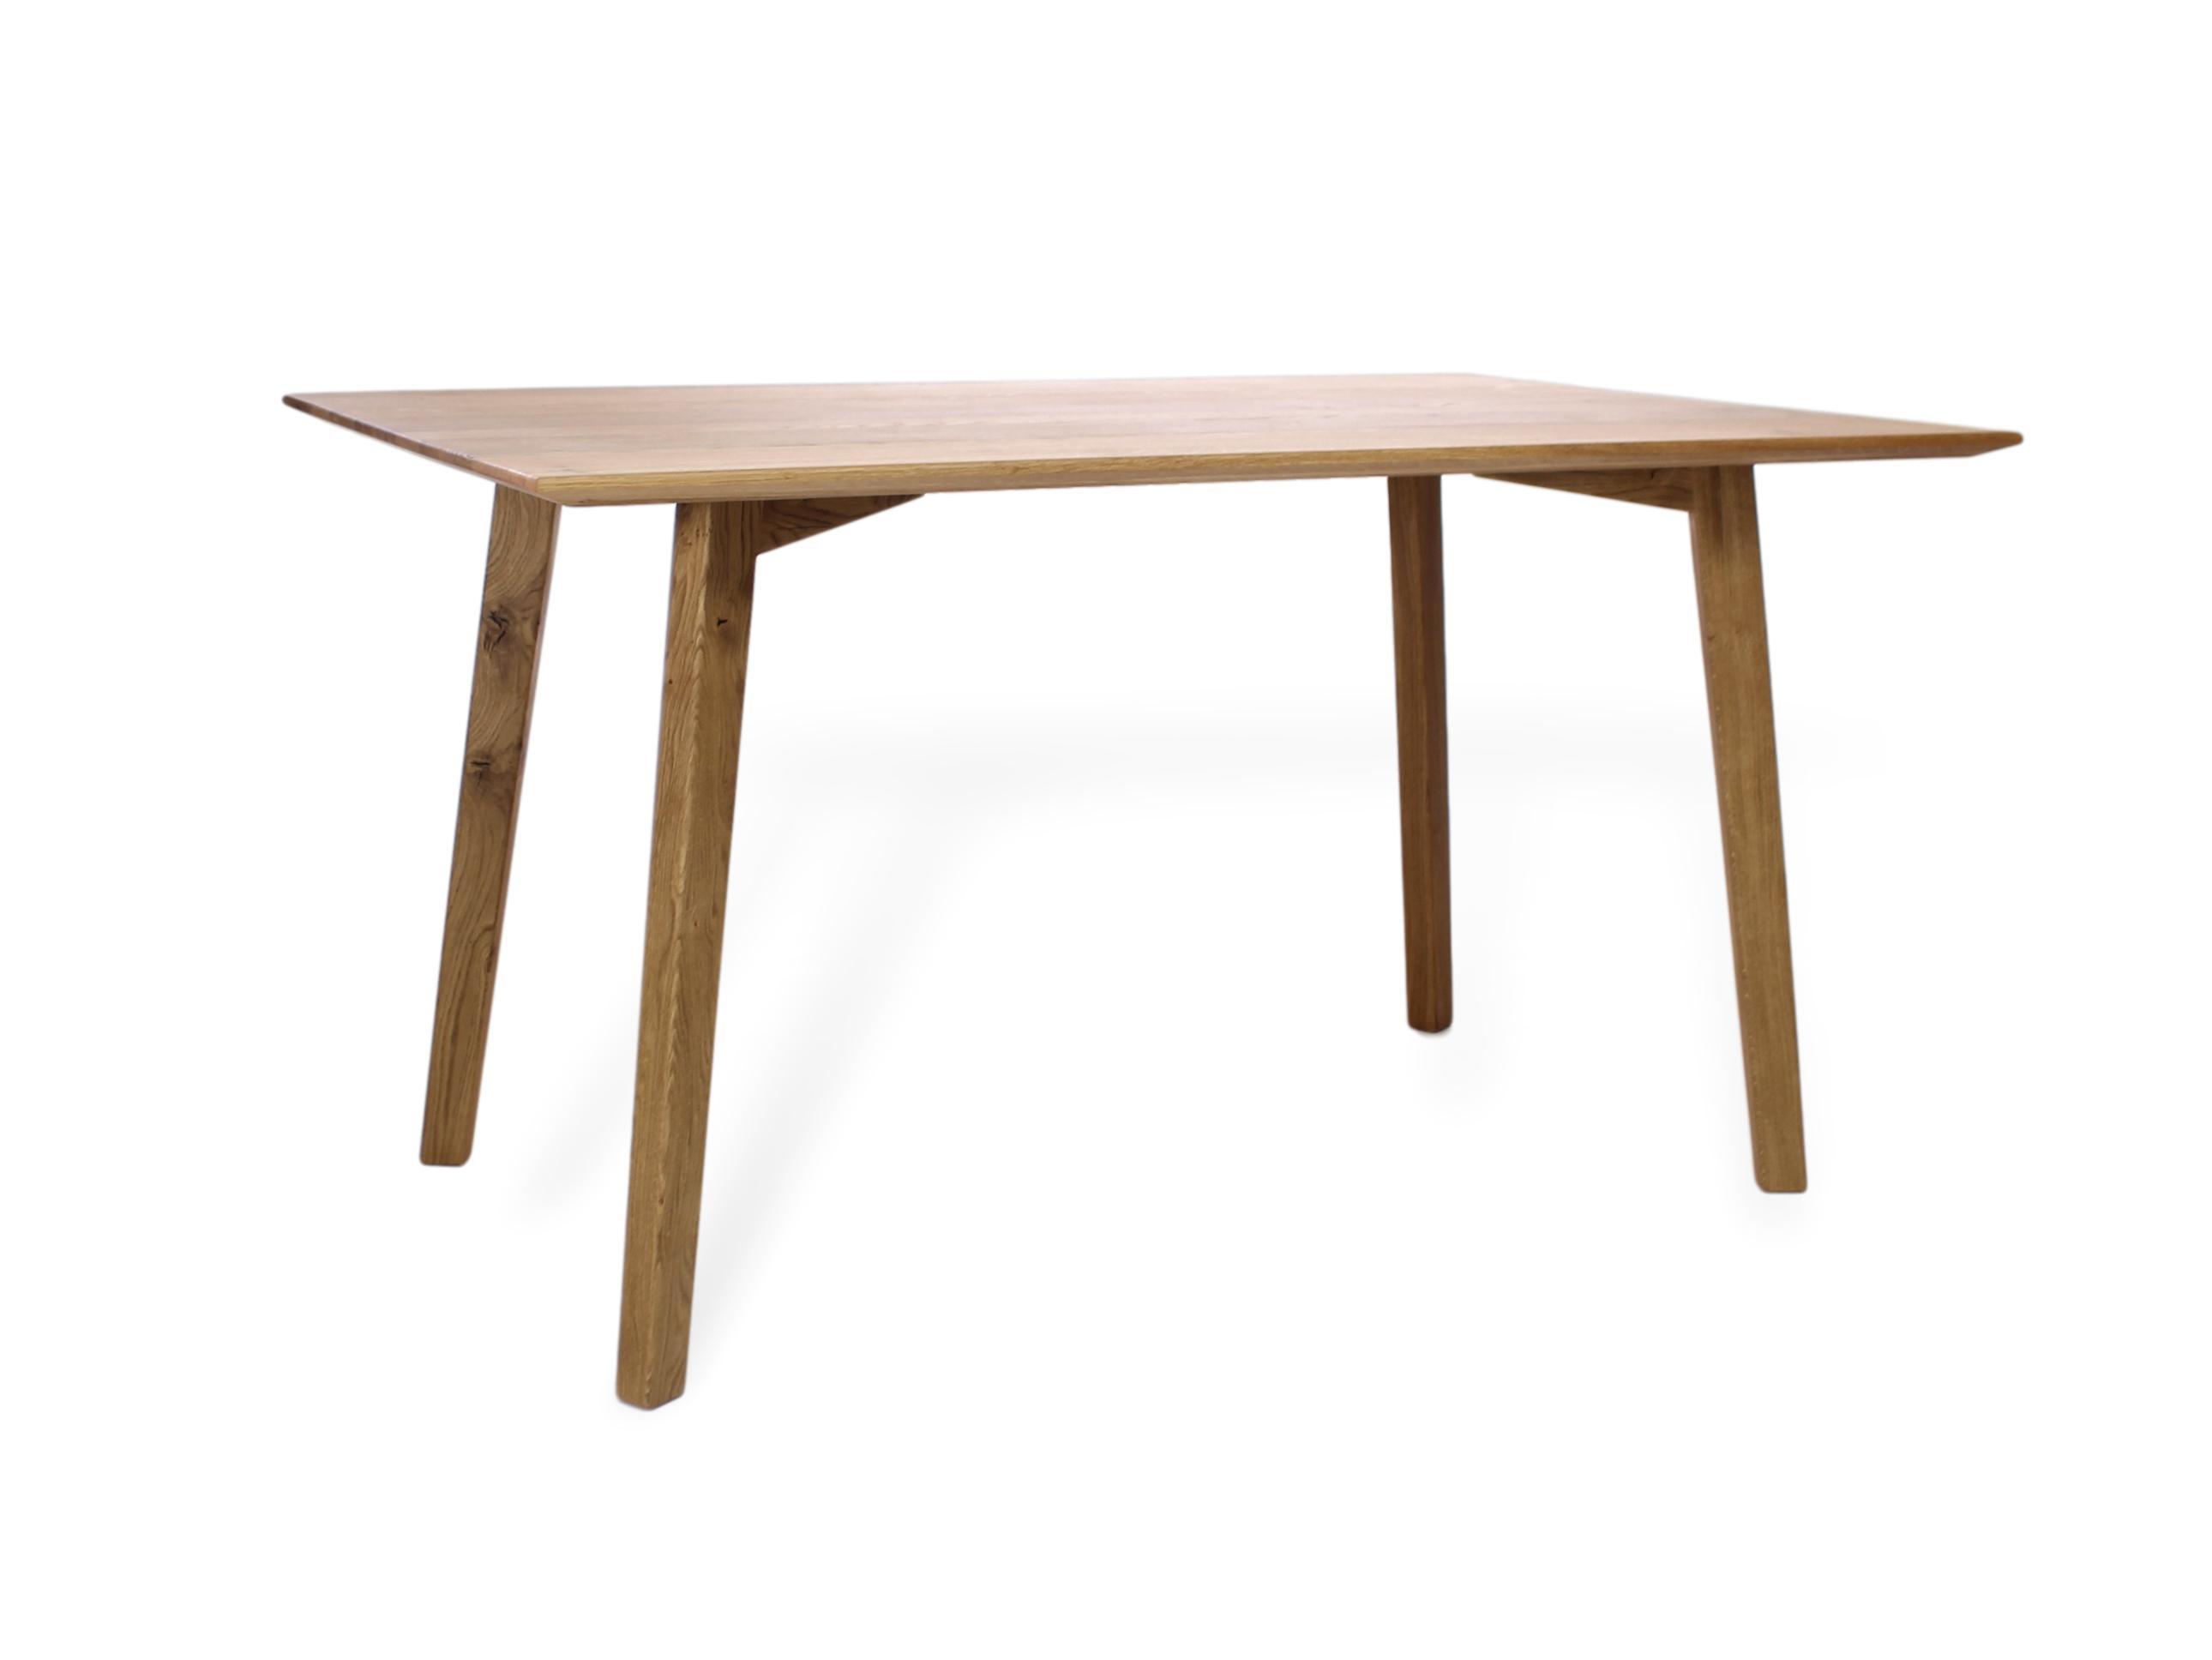 Moderner Esstisch Aus Massivholz Naturnah M Bel